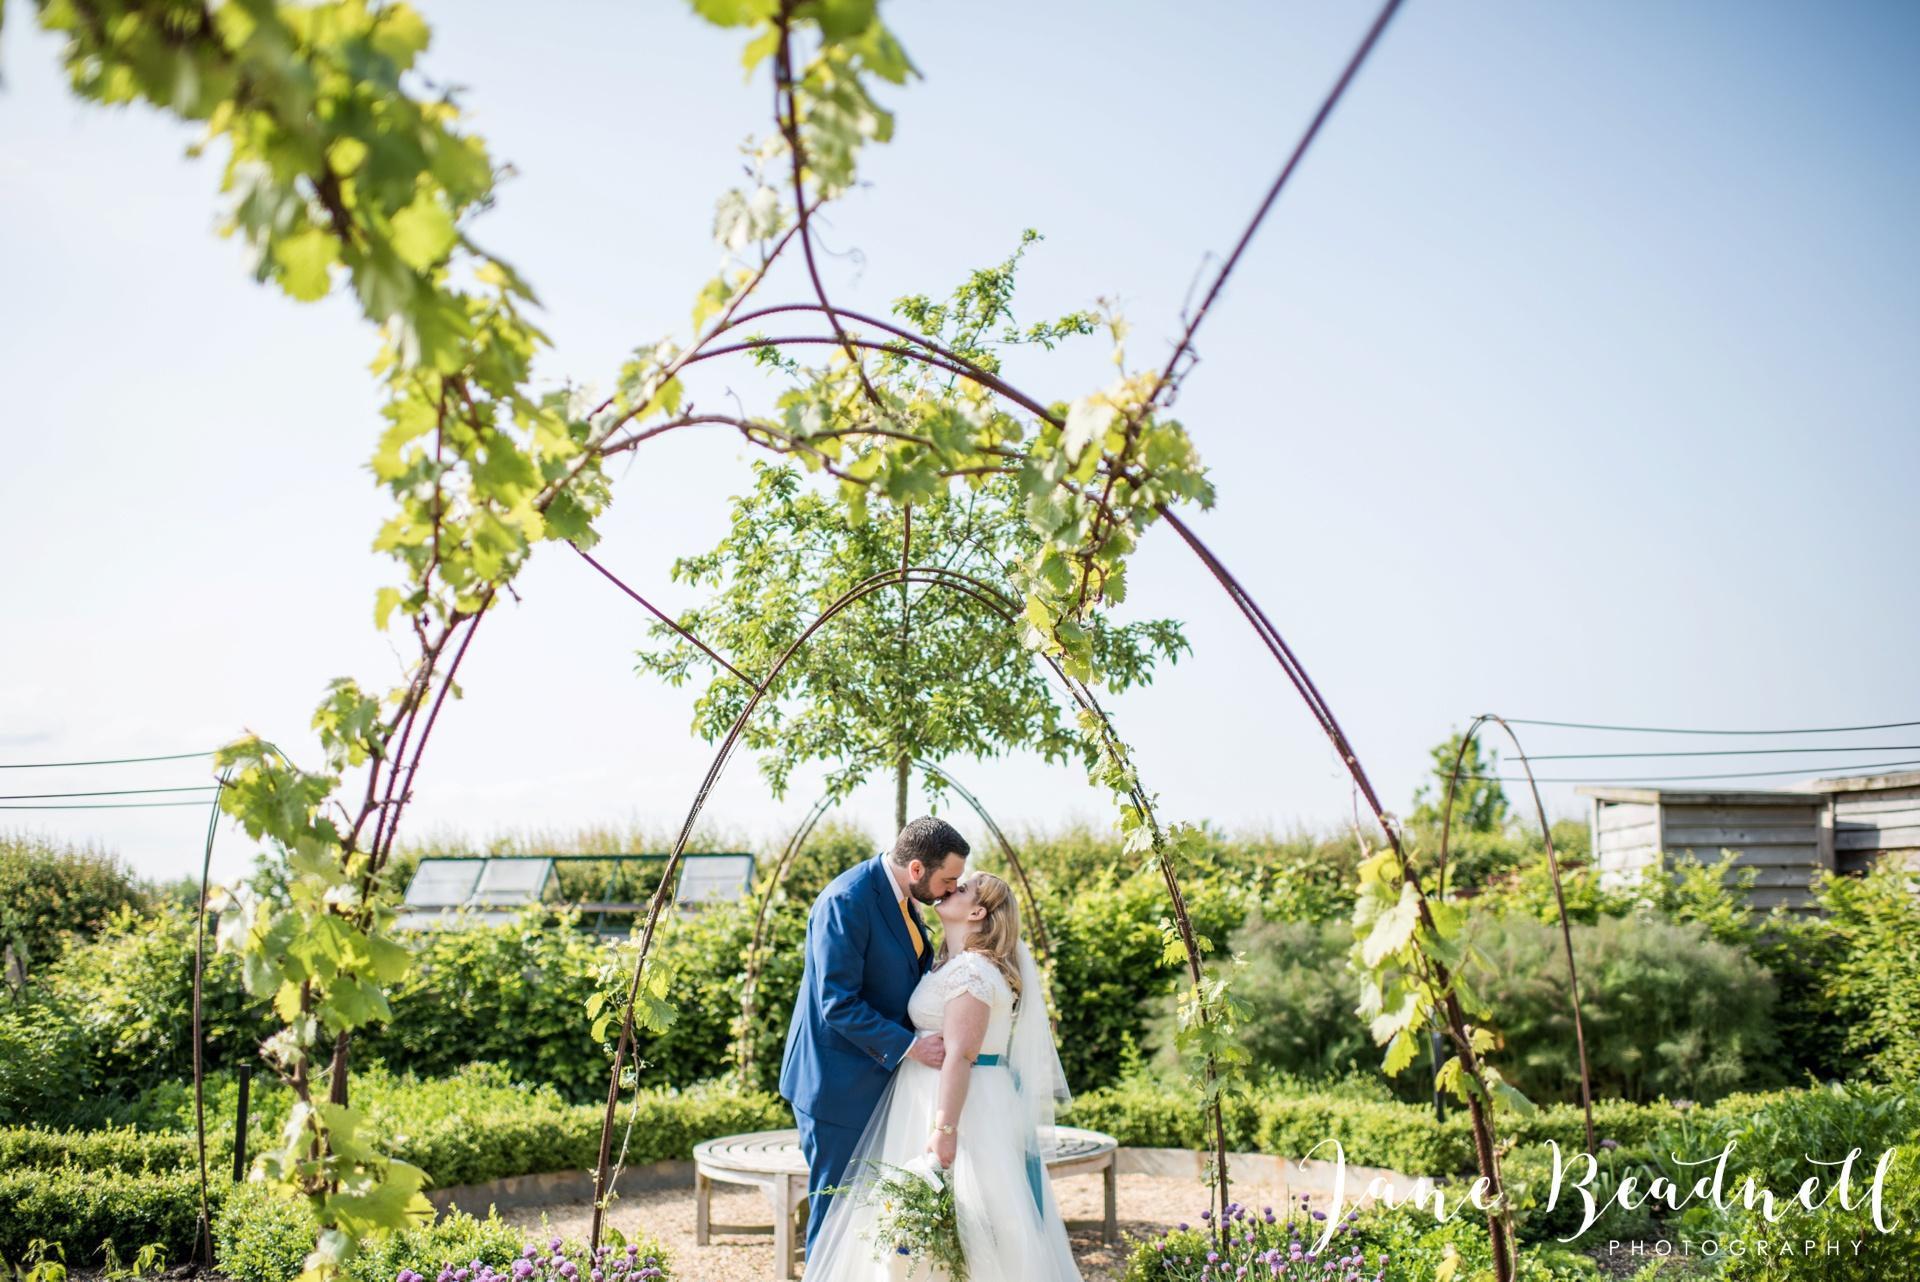 South Farm Wedding photography Hertfordshire by Jane Beadnell Photography fine art wedding photographer_0123